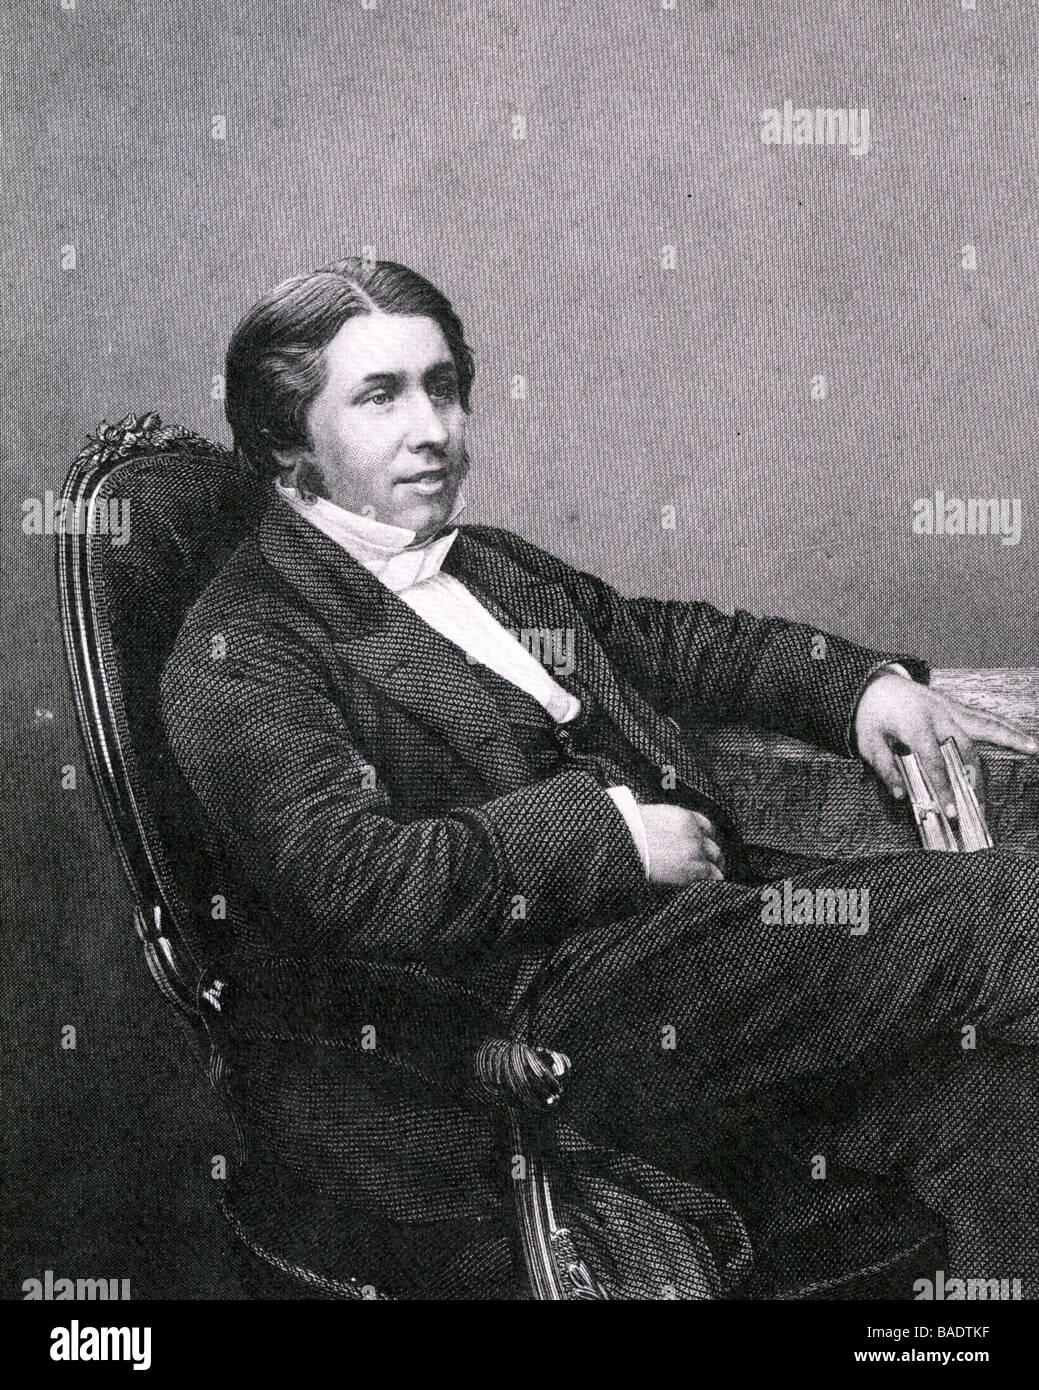 DR CHARLES SPURGEON (1834-92) prominent English Baptist - Stock Image